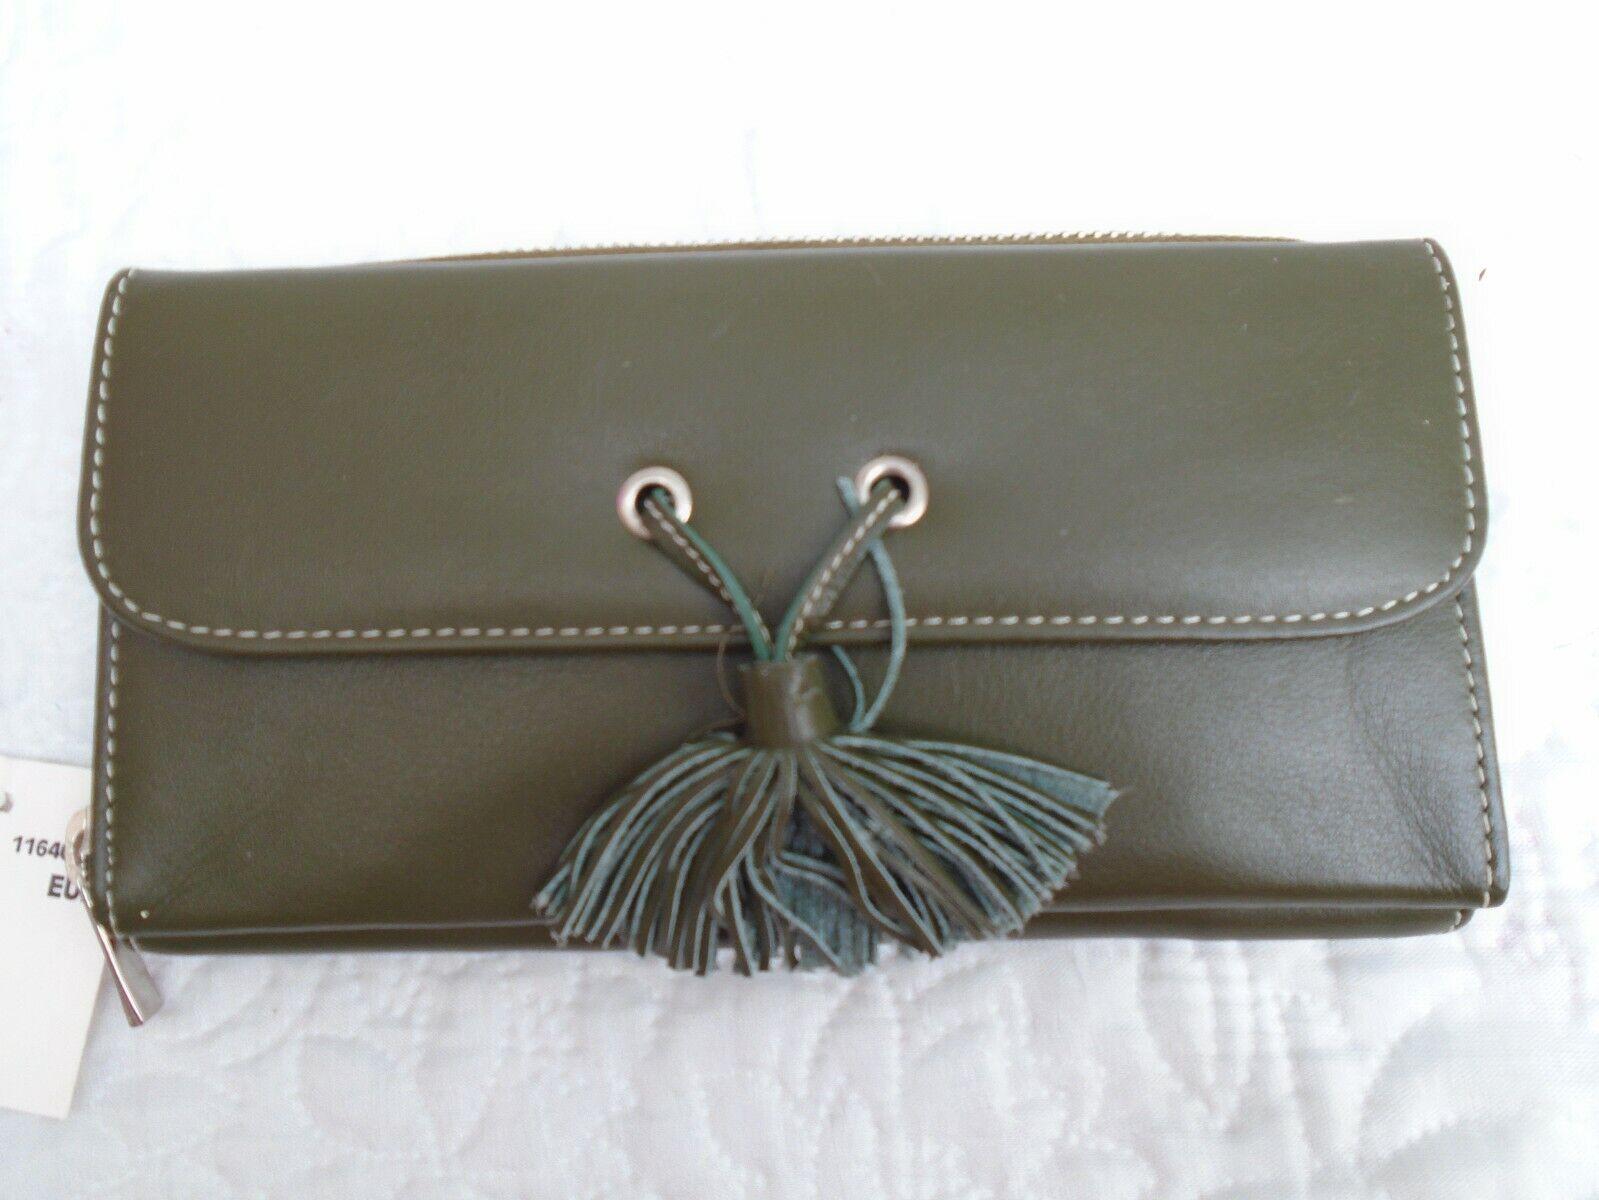 Golunski Genuine Leather Olive Green Purse BNWT